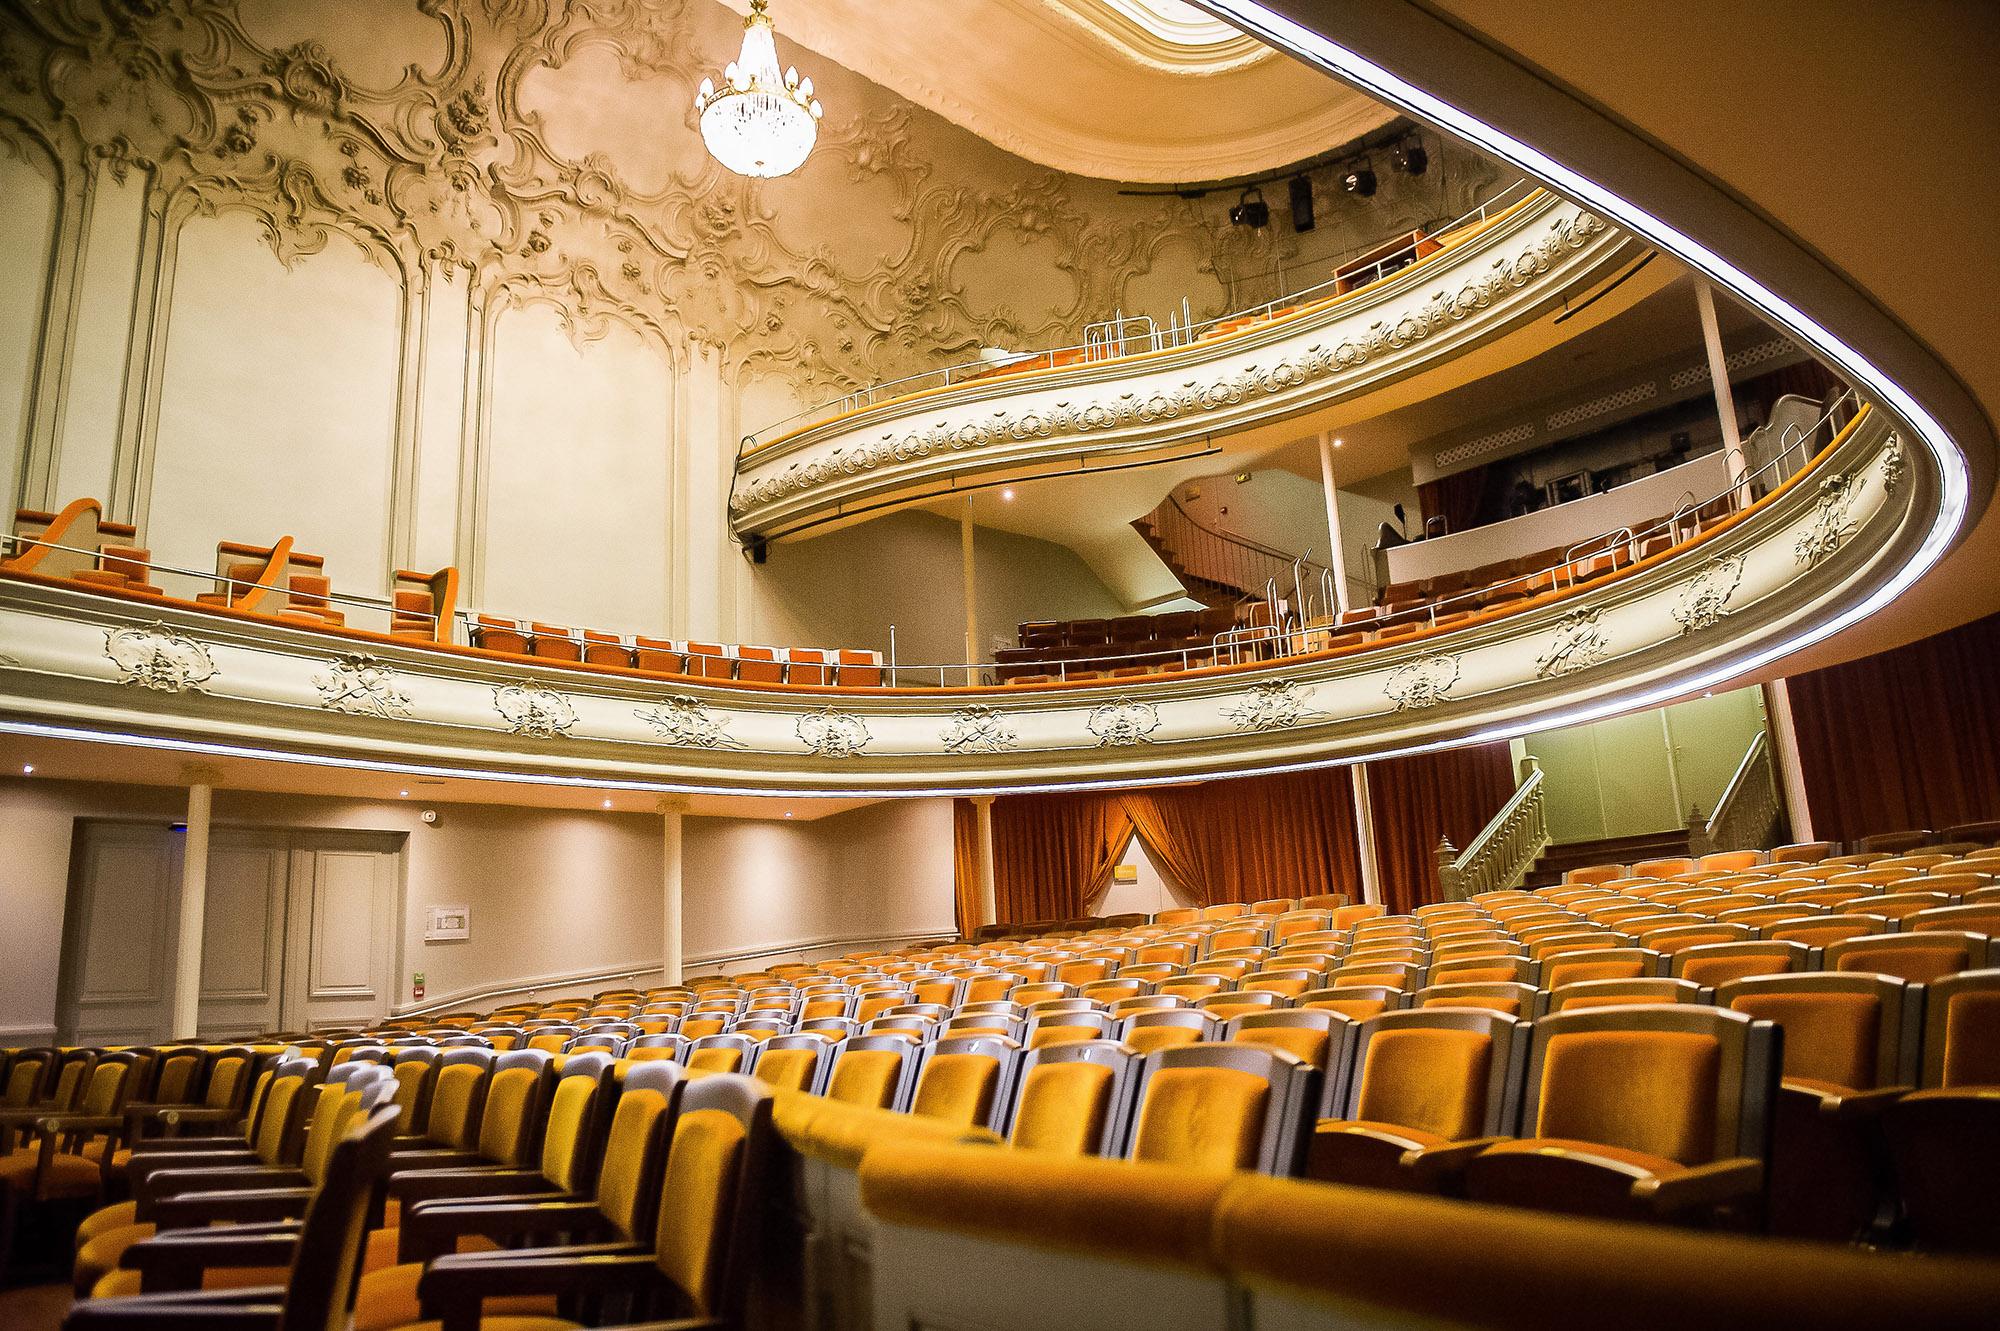 Concert halls, theaters, casino